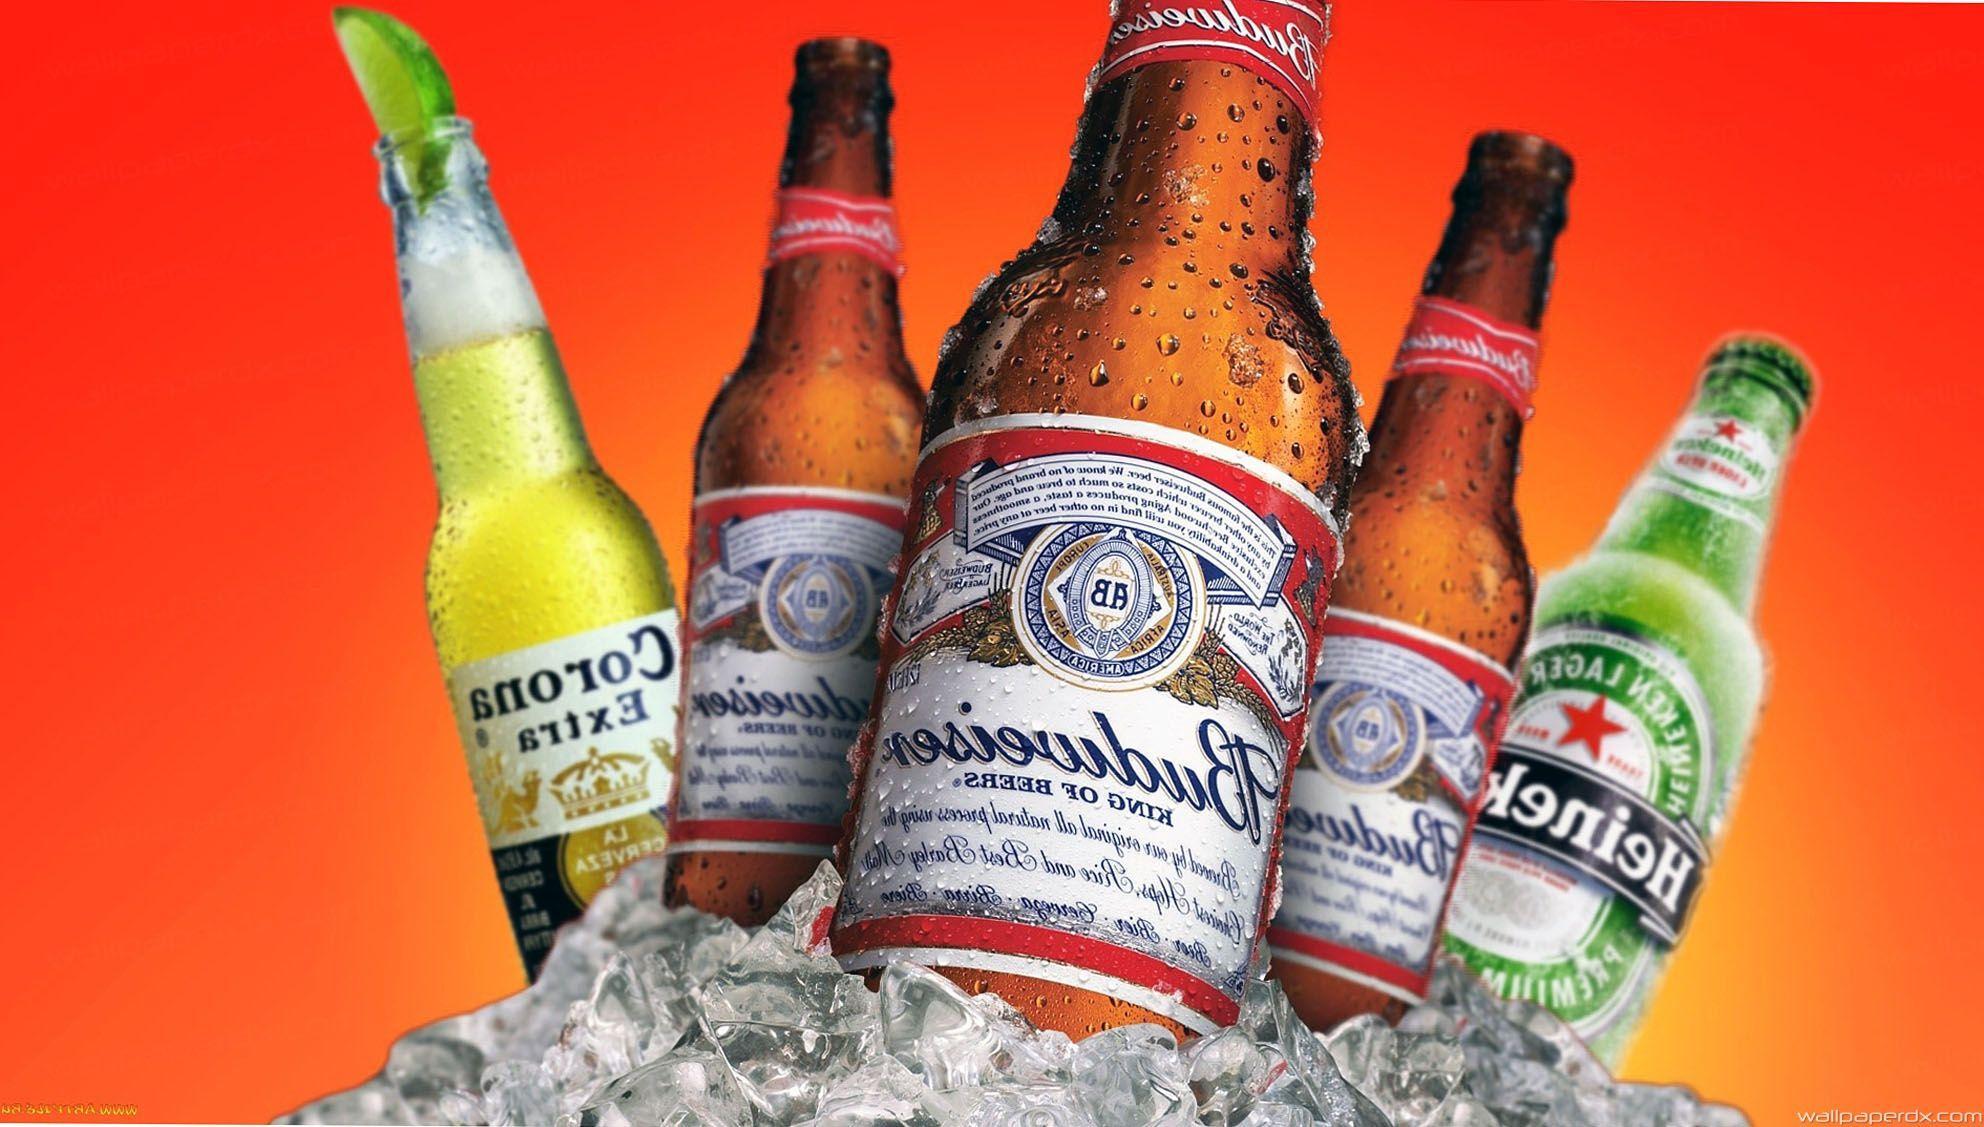 Download Wallpaper 1920x1080 budweiser select, beer, brand ...  |Budweiser Select Wallpaper